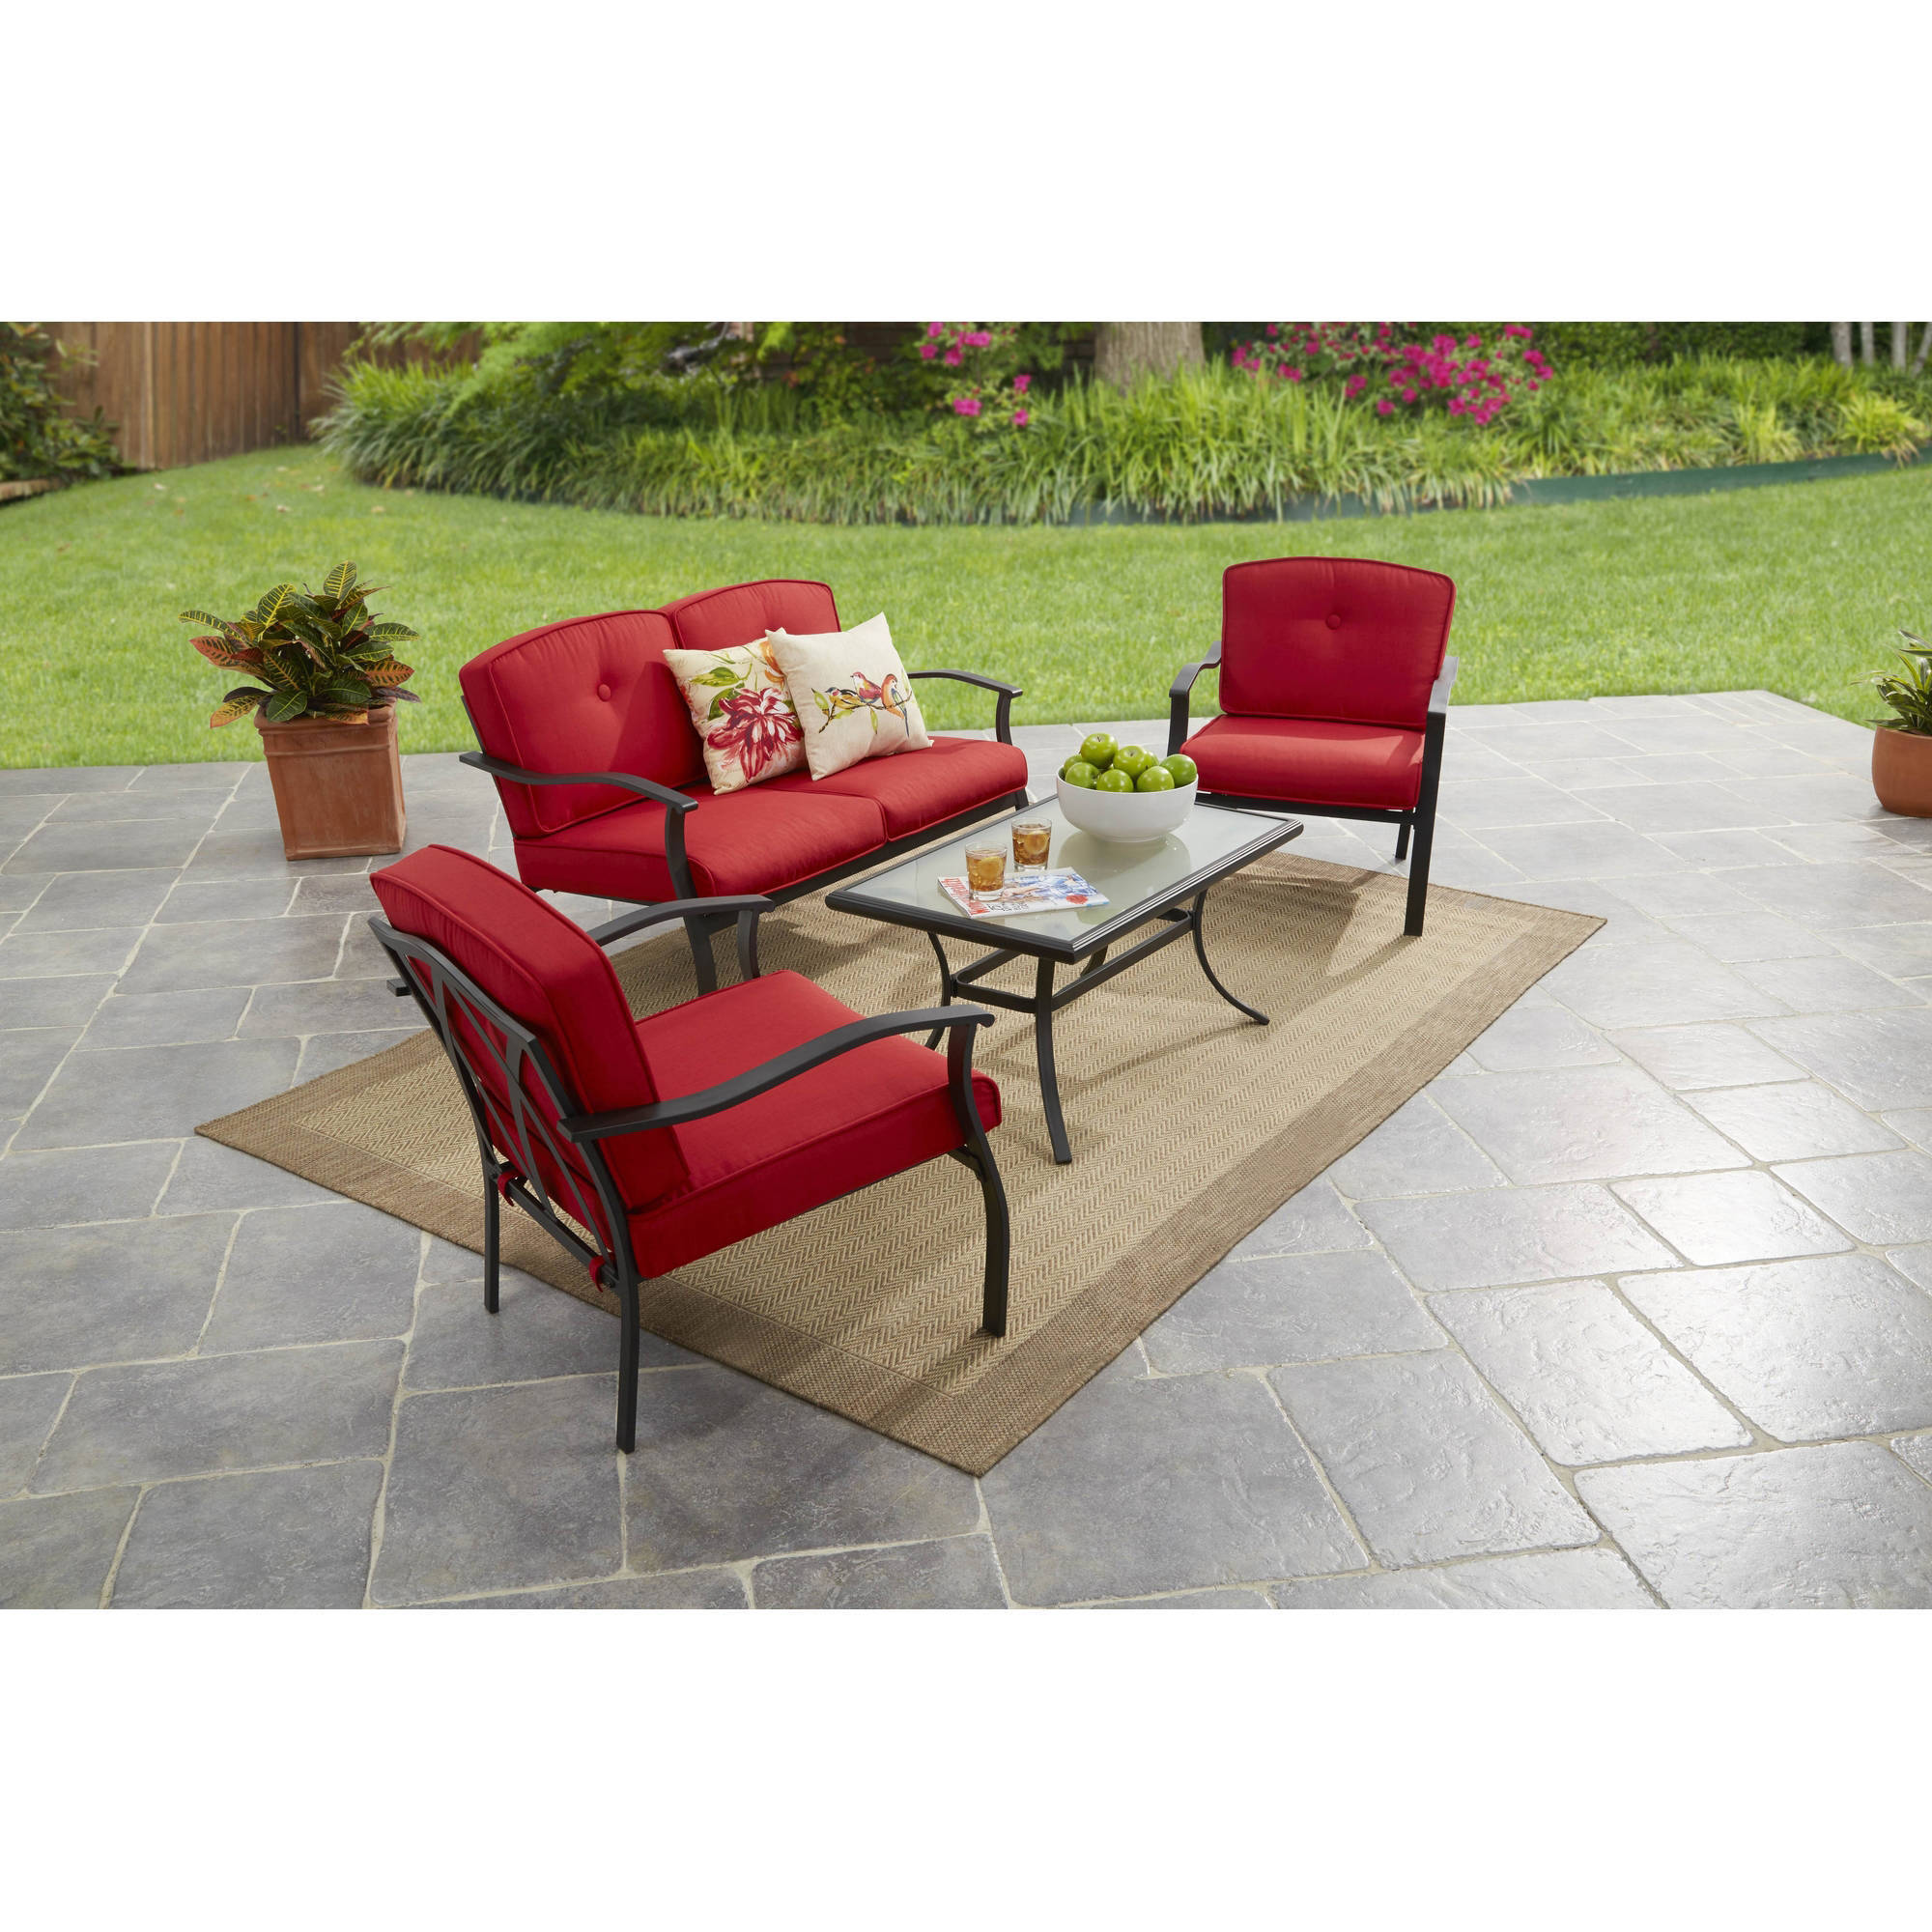 mainstays belden park 4 piece outdoor sofa set for patio red seats 4